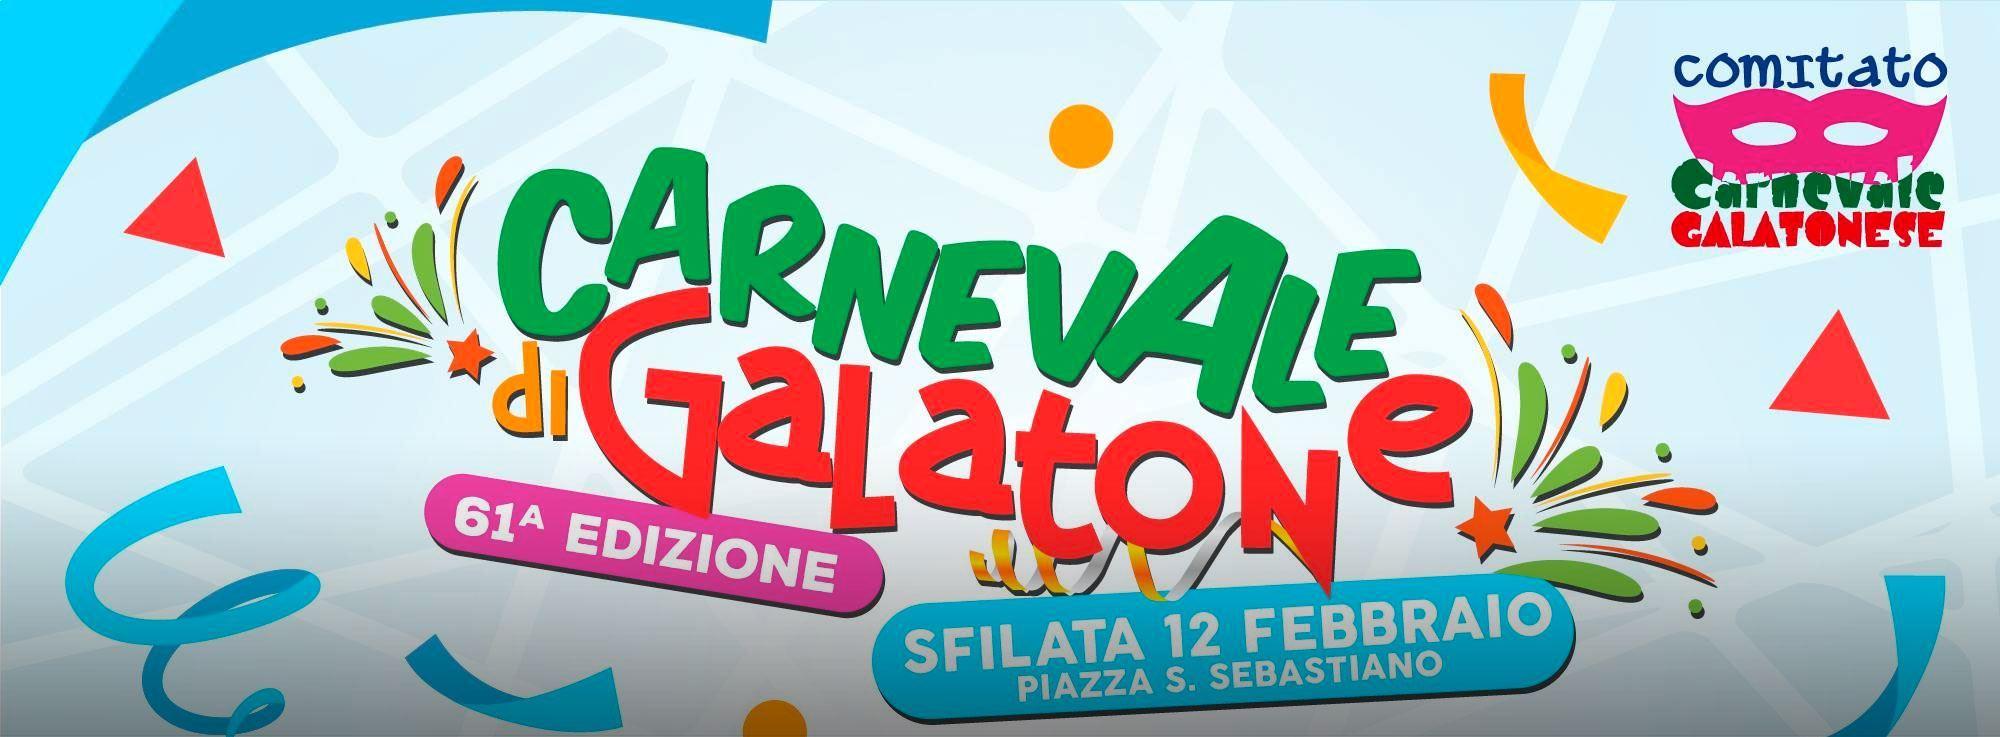 Galatone: Carnevale di Galatone